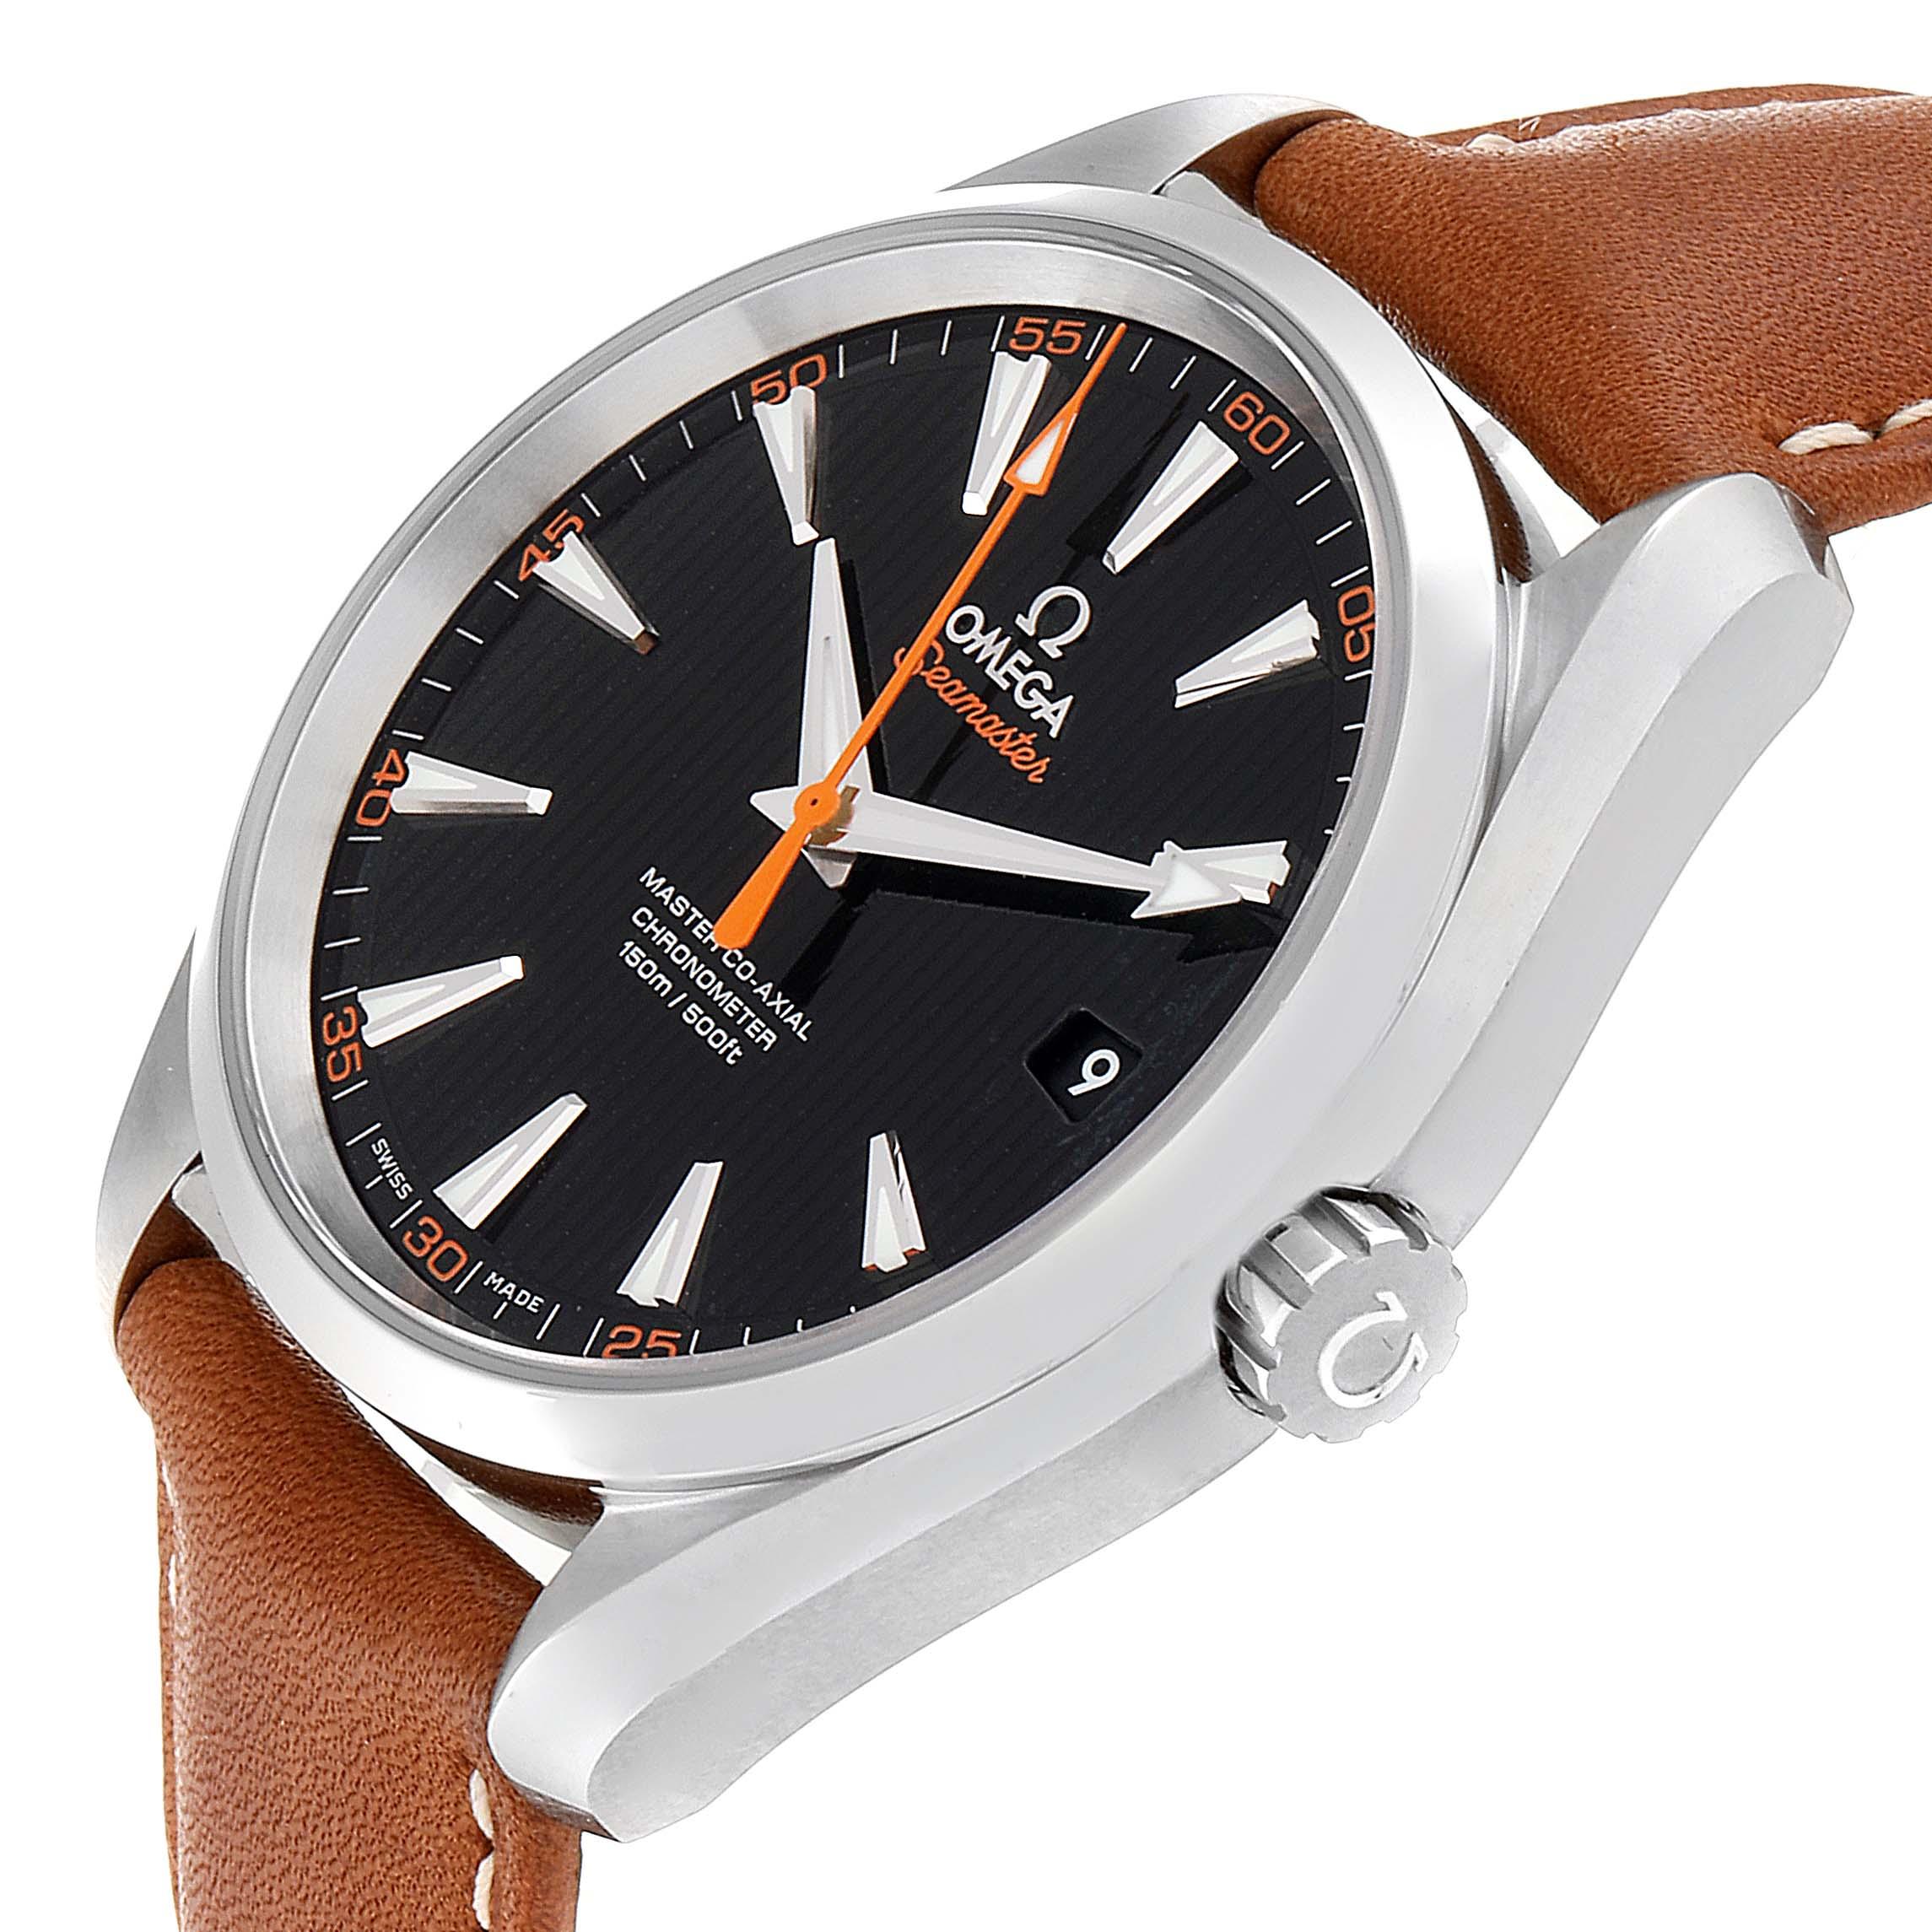 Omega Aqua Terra 150m Master 41.5mm Watch 231.12.42.21.01.002 Unworn SwissWatchExpo